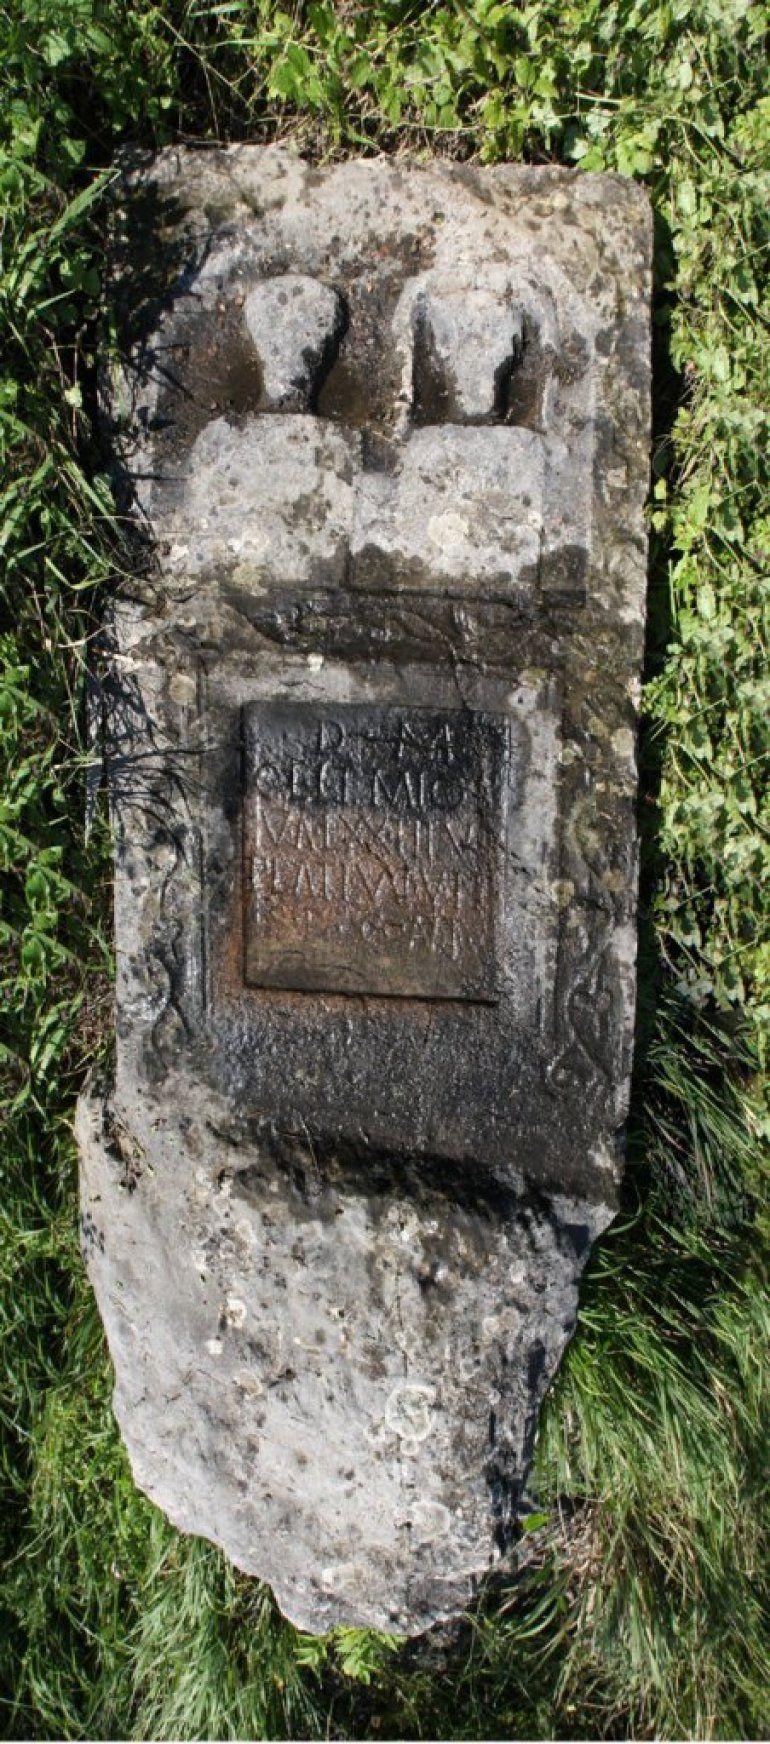 Стела - Римски надгробни споменик у Радоињи, Фото Архива Музеја у Ужицу